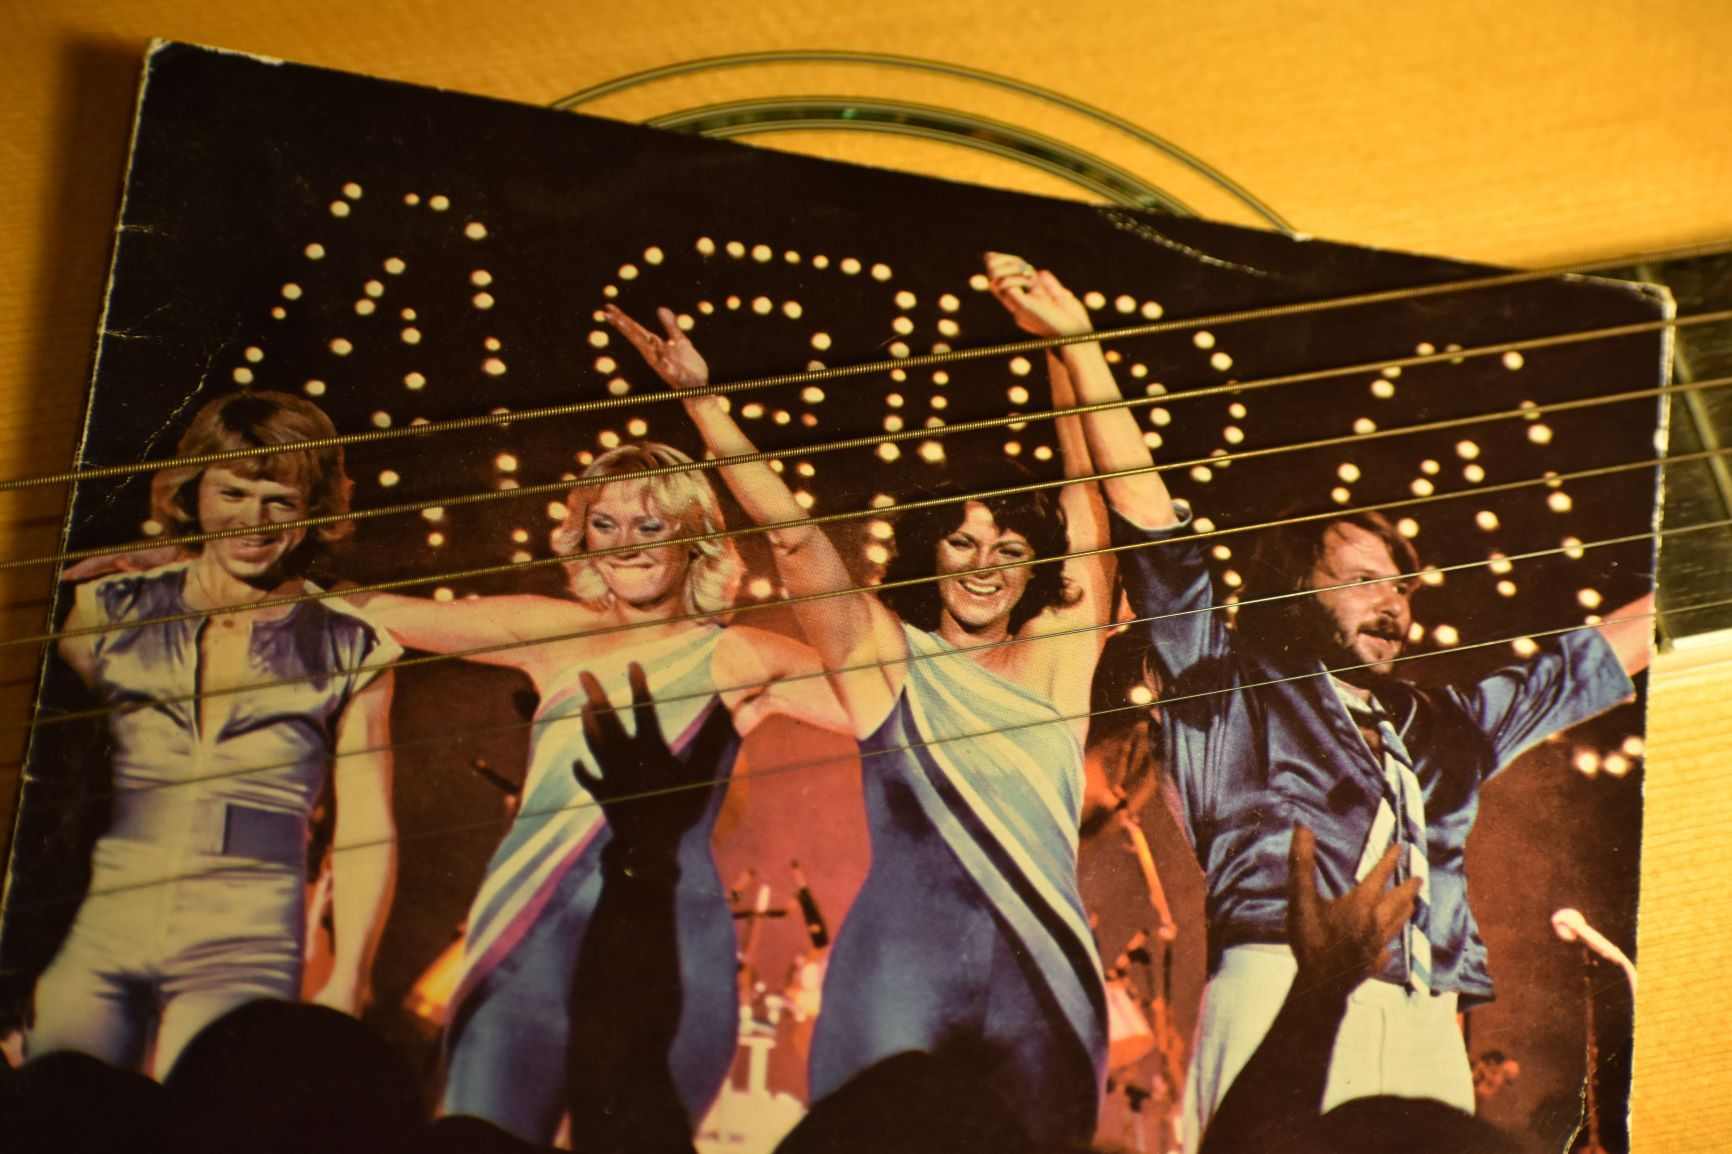 Mamma Mia: a boat party que te leva até aos anos 70 e 80. E tem shots à borla!